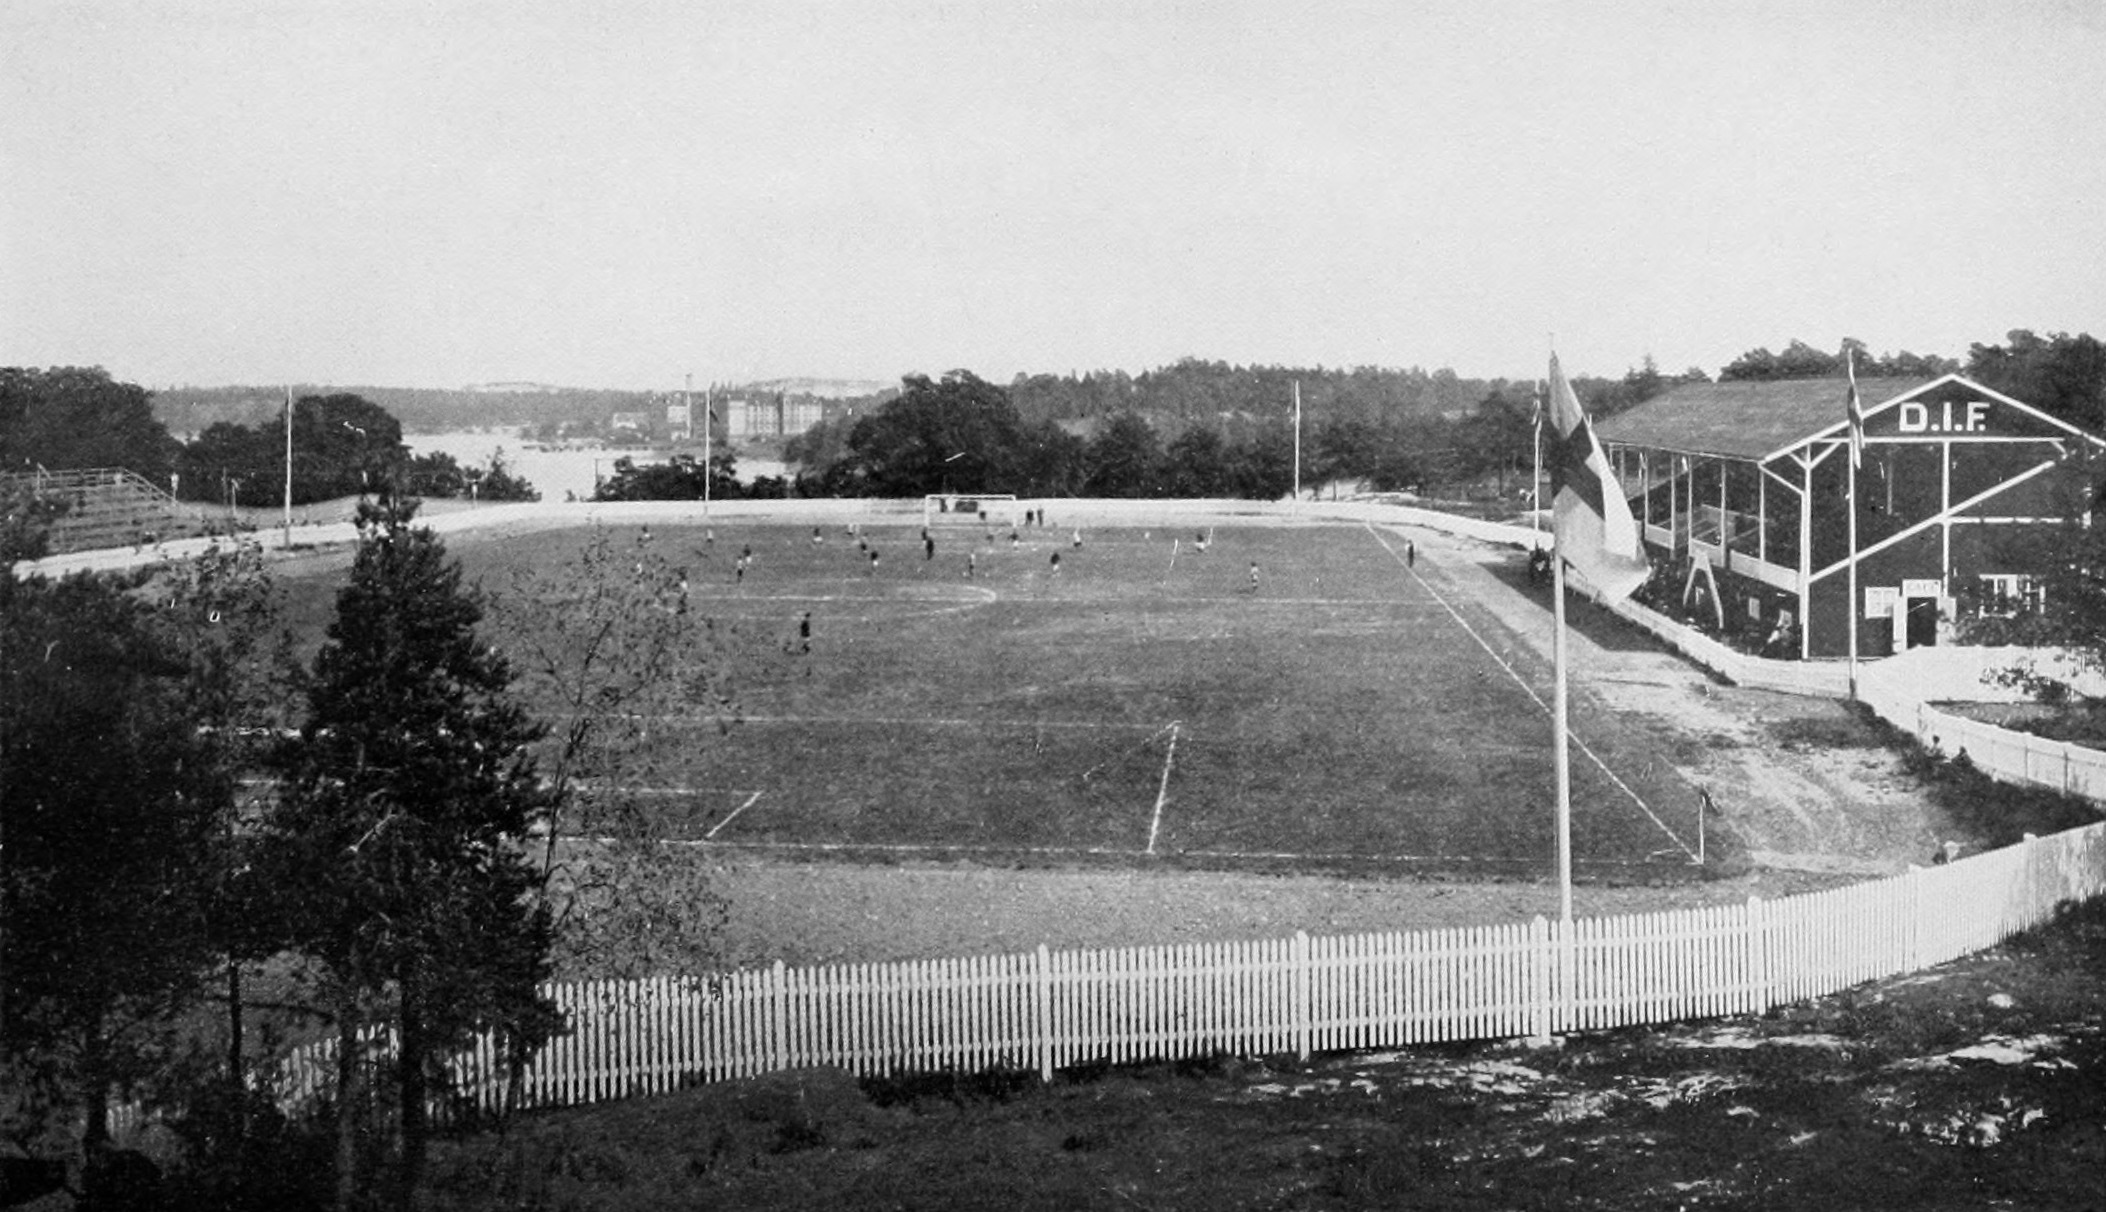 Datei:Traneberg 1912.jpg